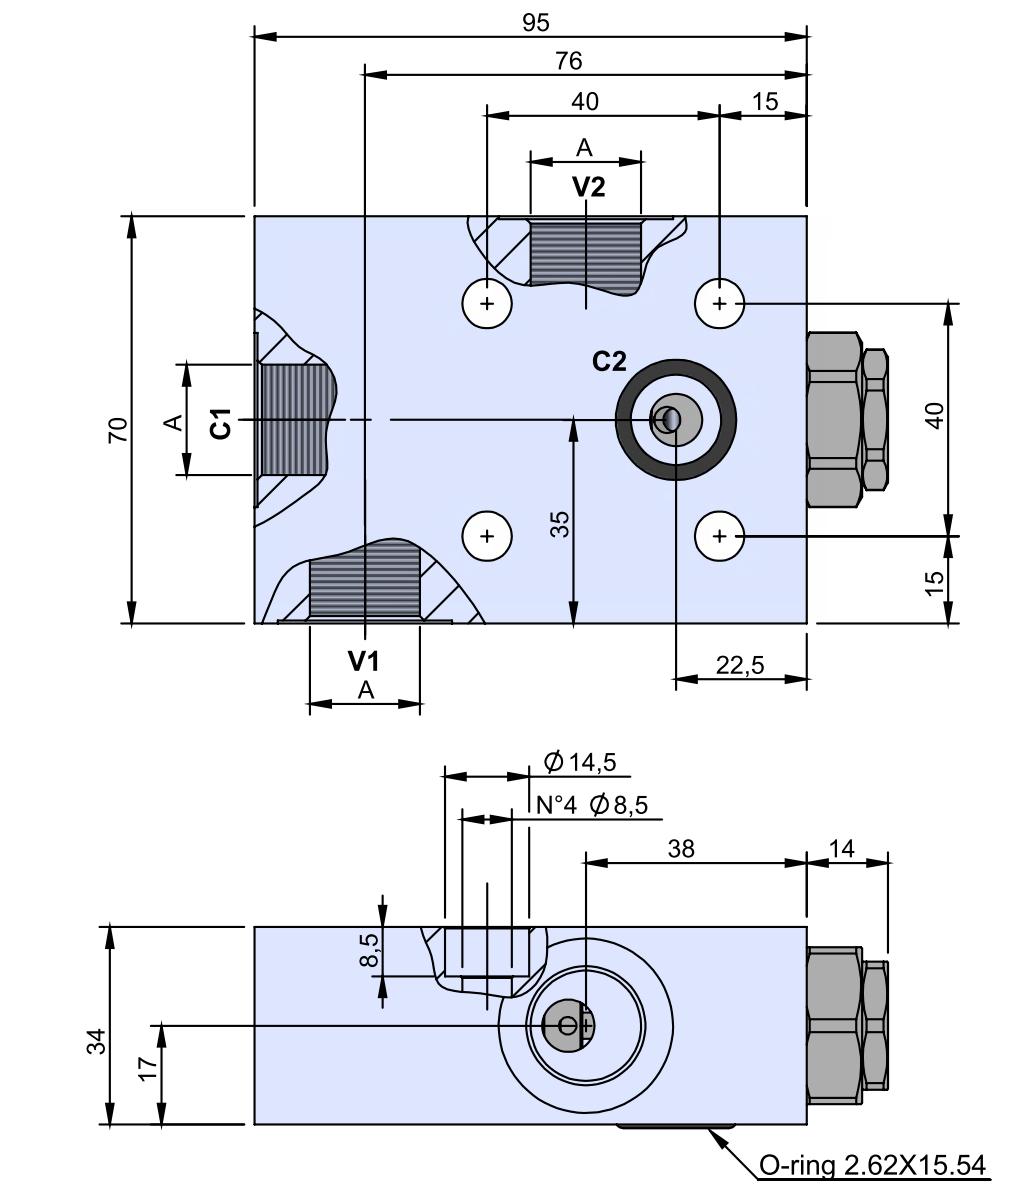 POC-1-FL схема